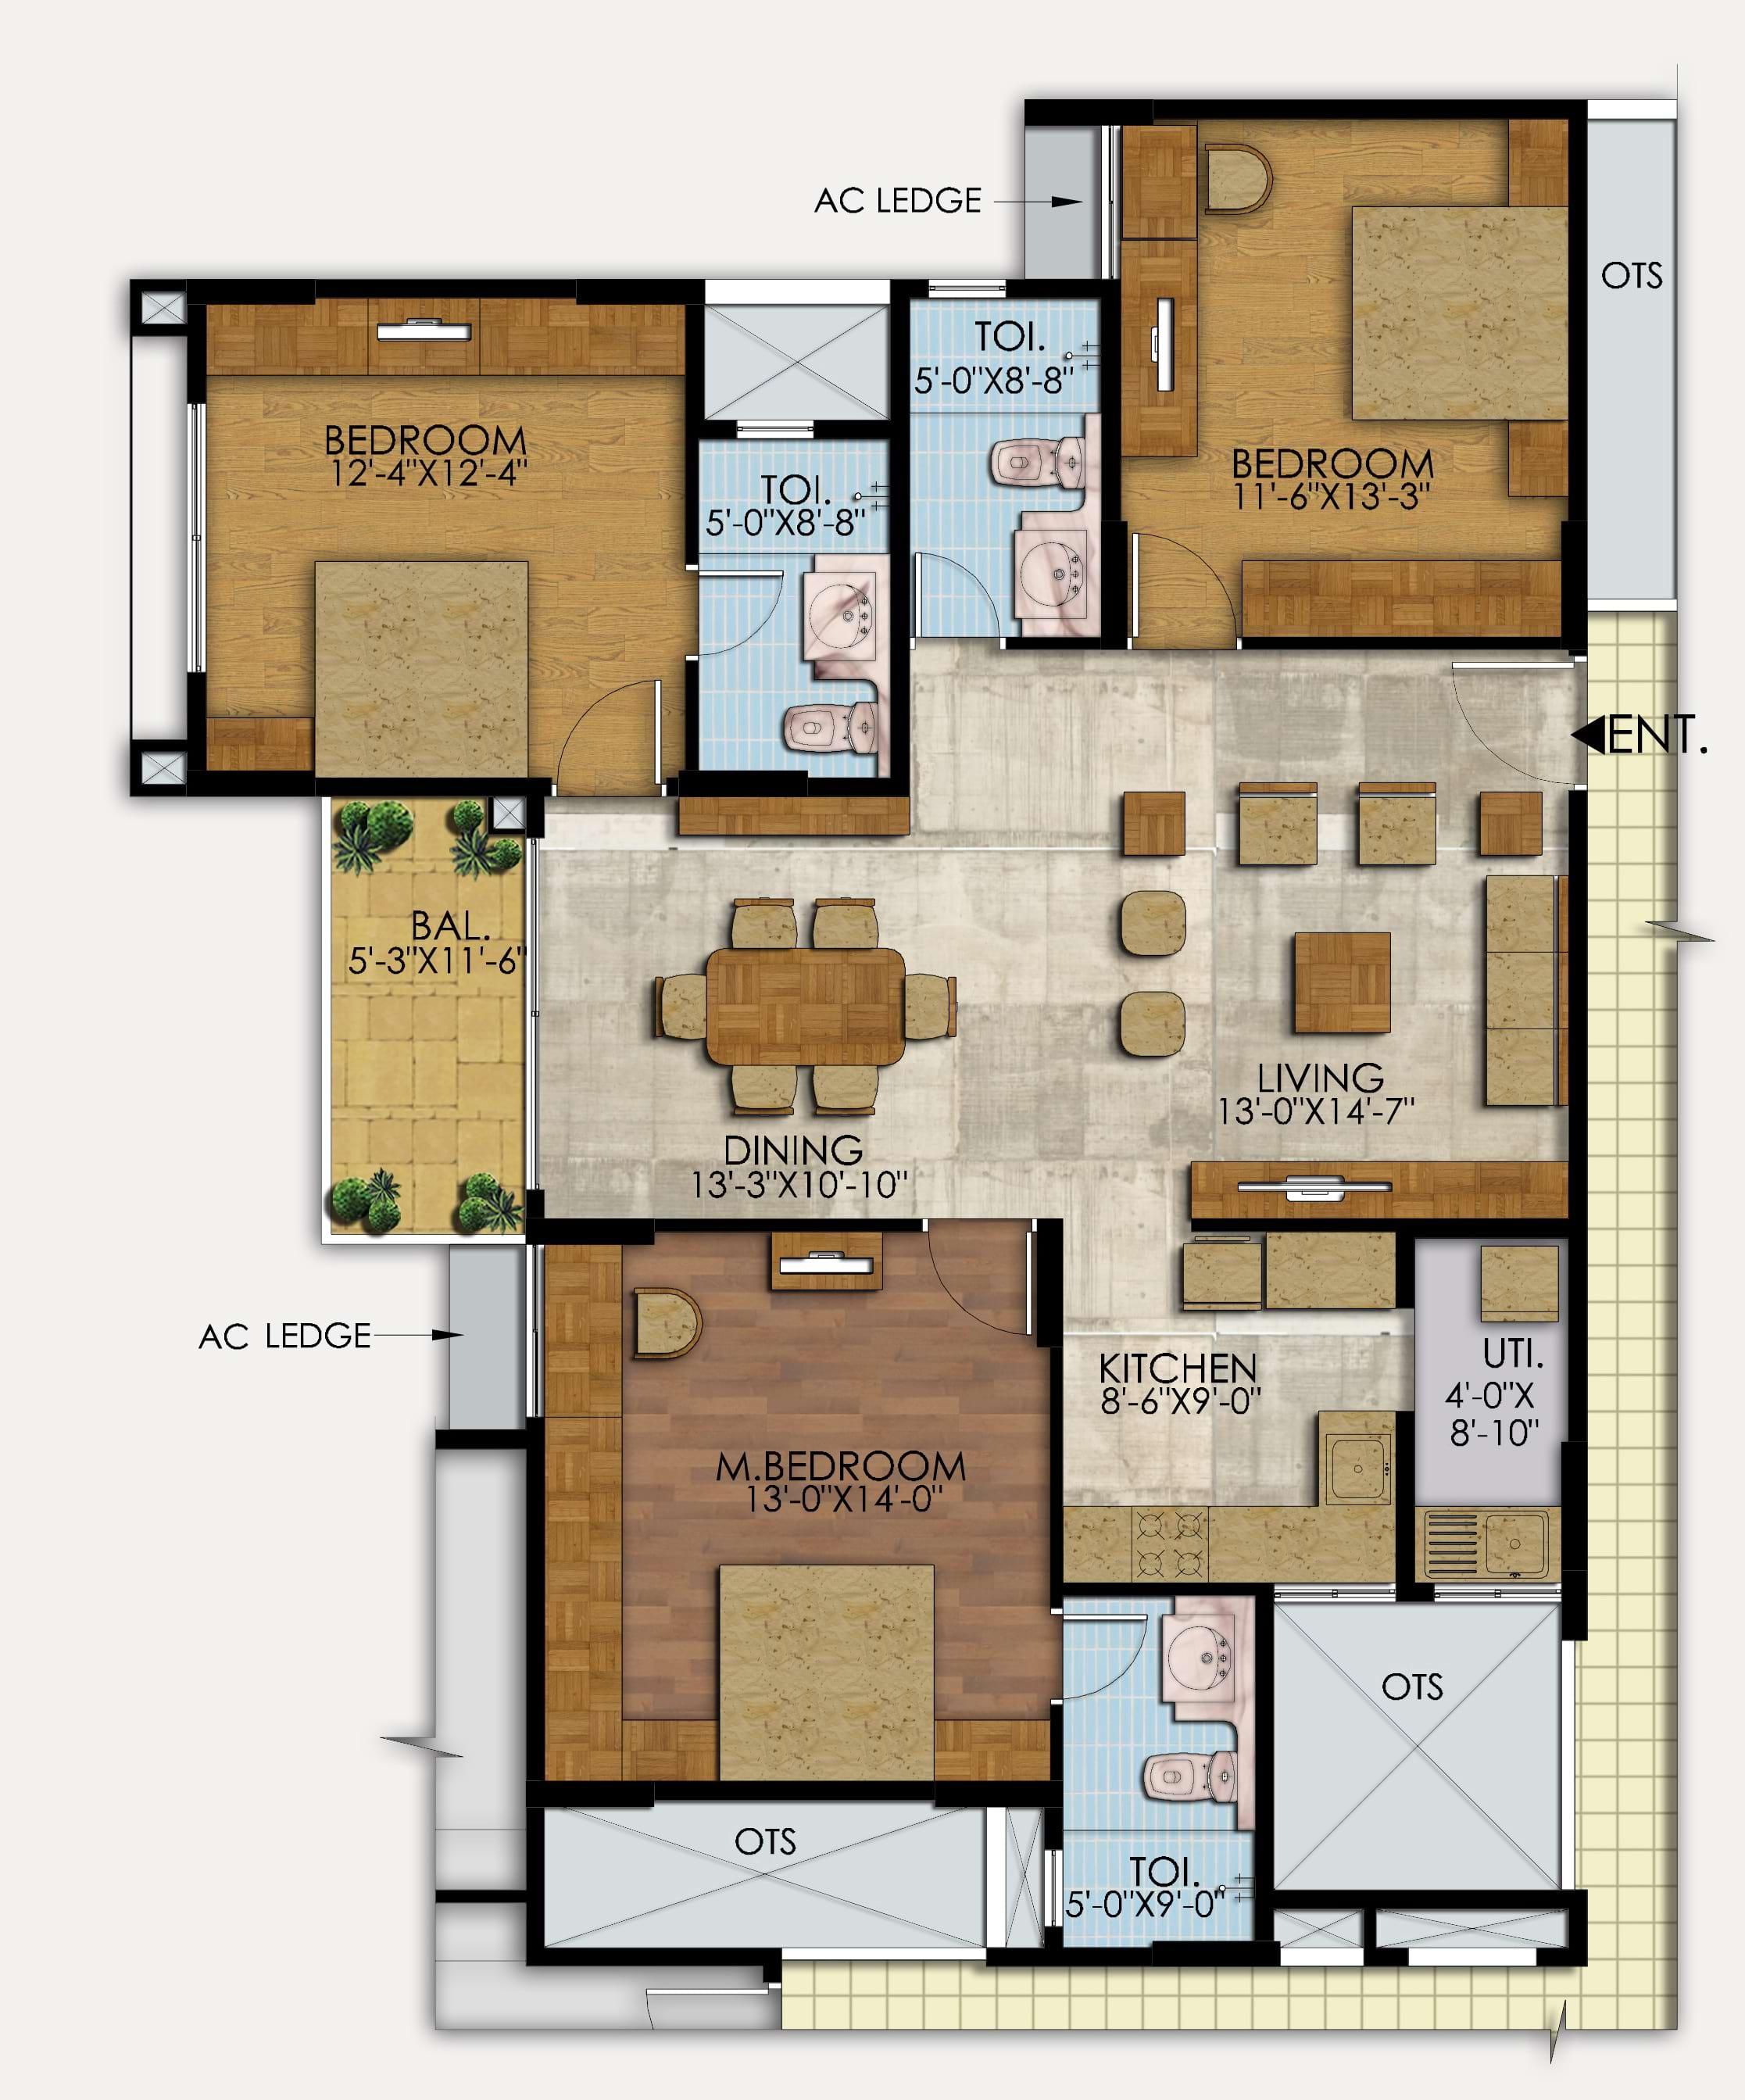 Mahaveer-Ranches-3bhk-1541-sqft-floorplan